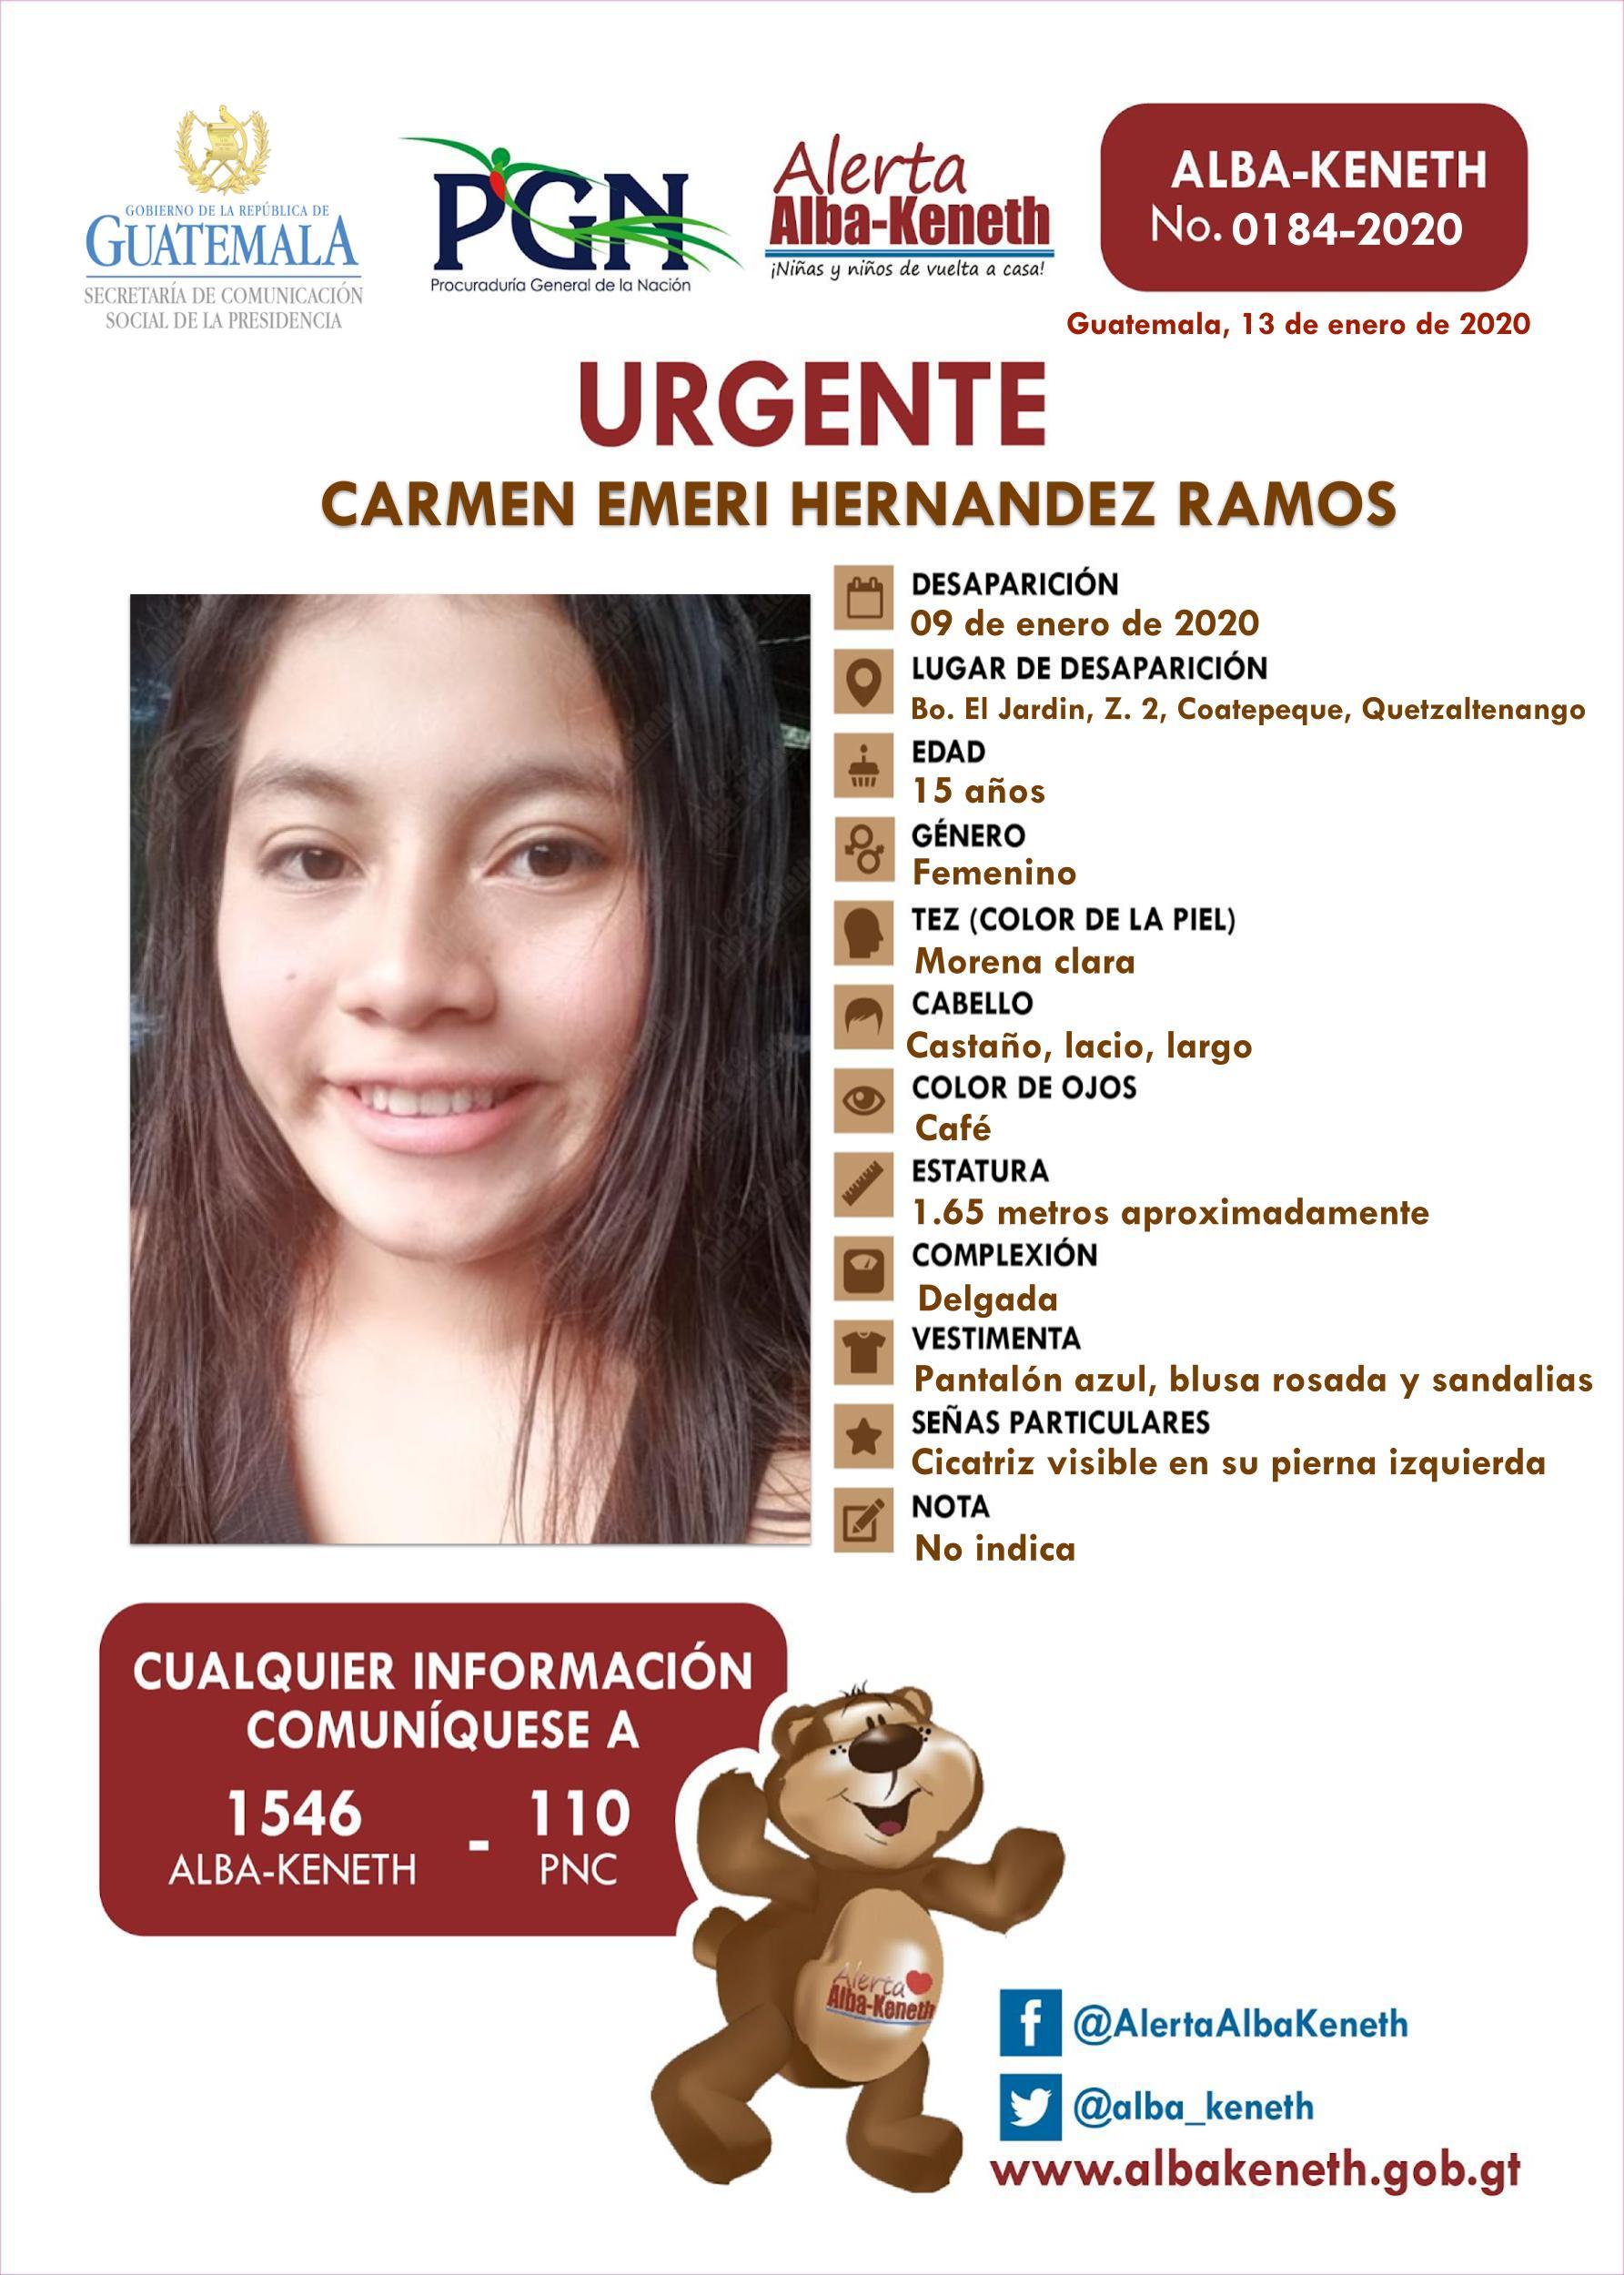 Carmen Emeri Hernandez Ramos